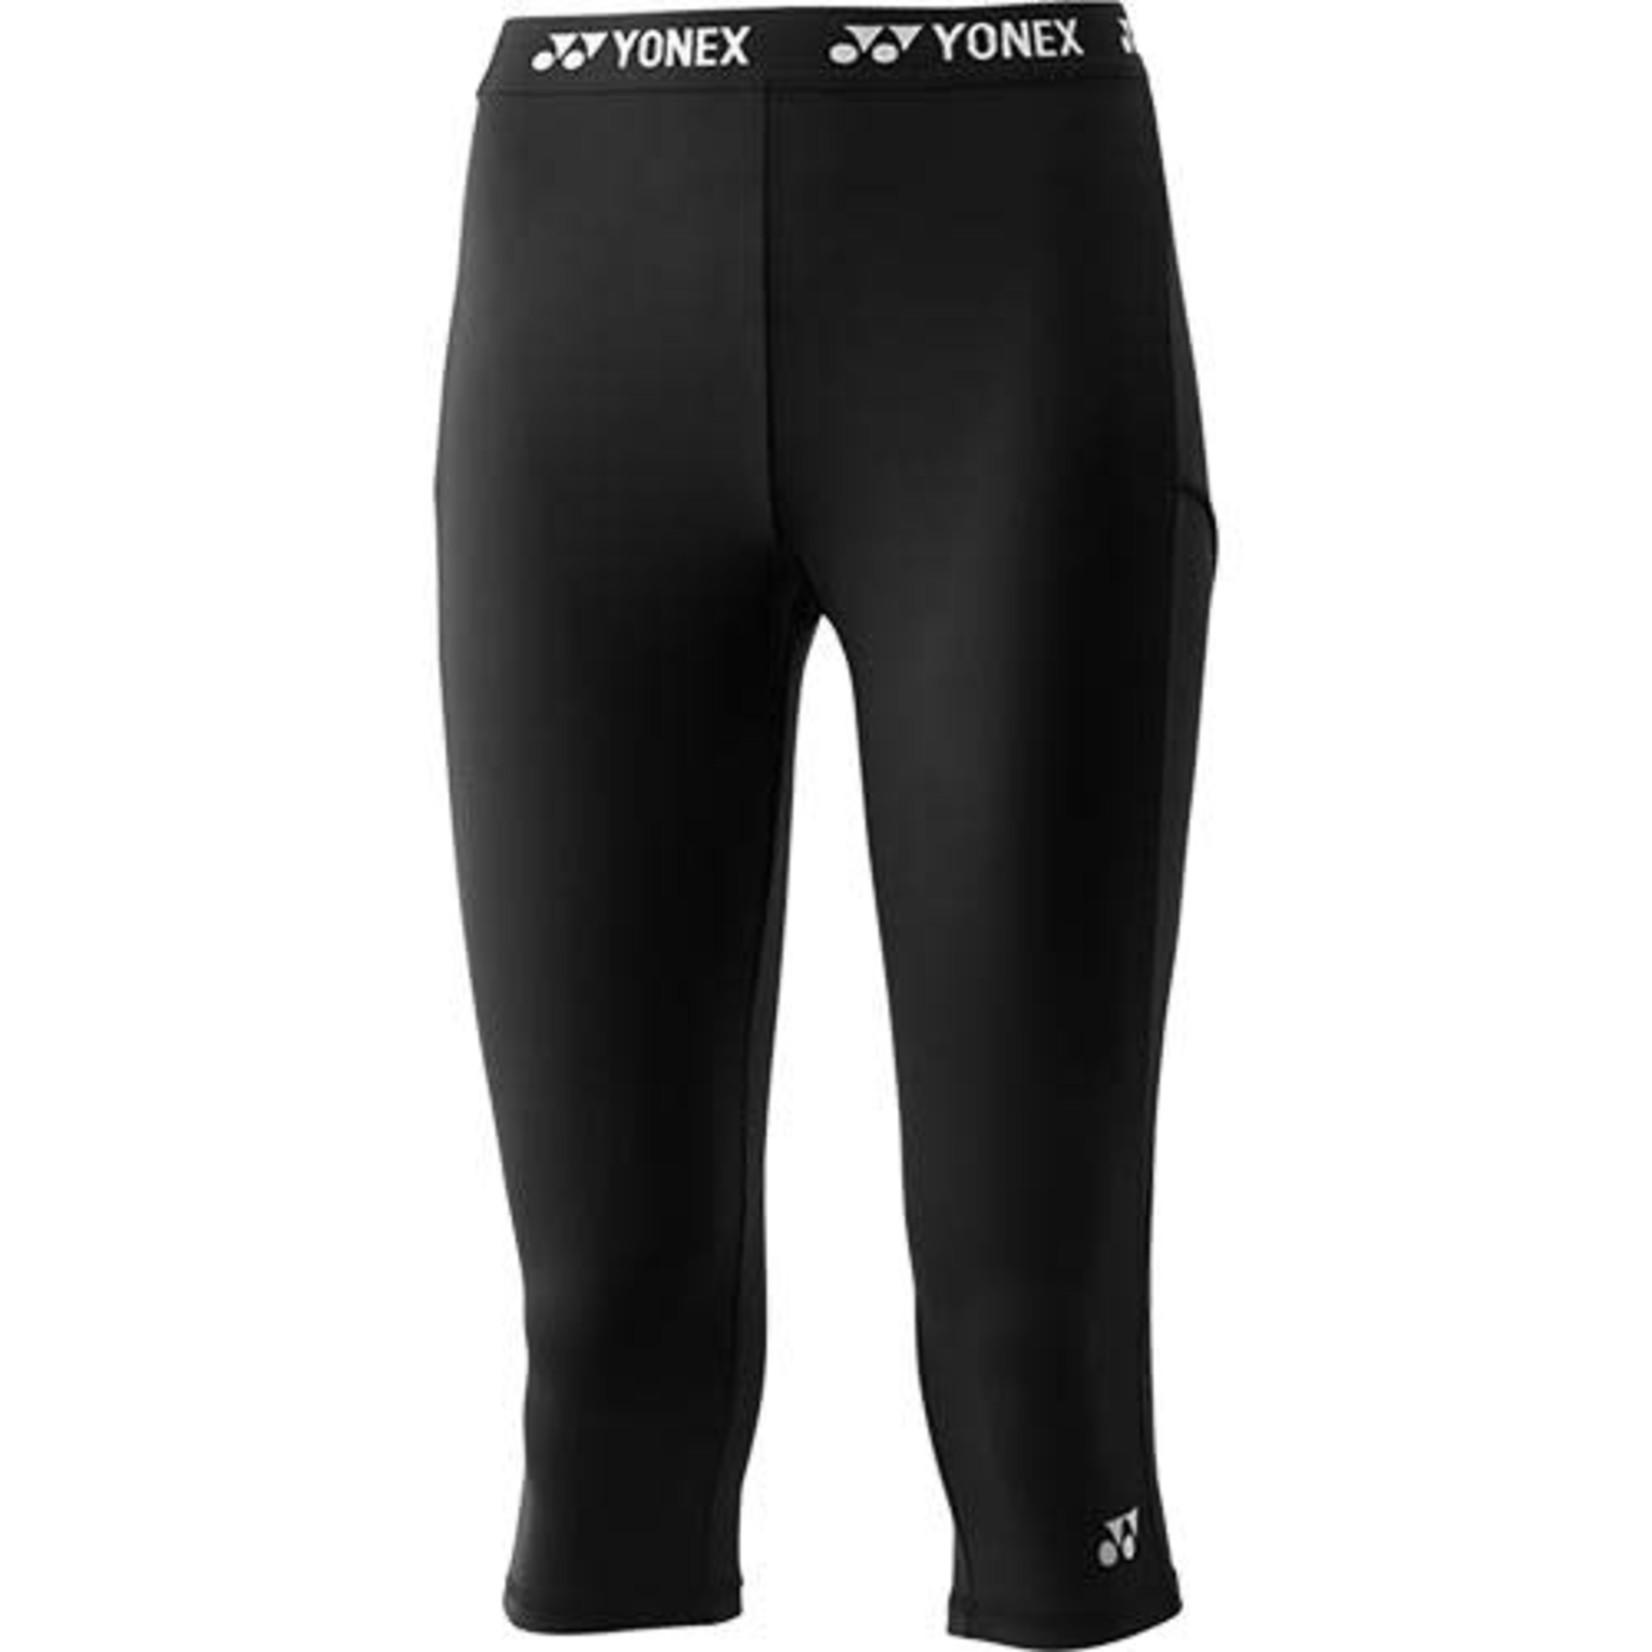 Yonex Yonex Legging 69010EX